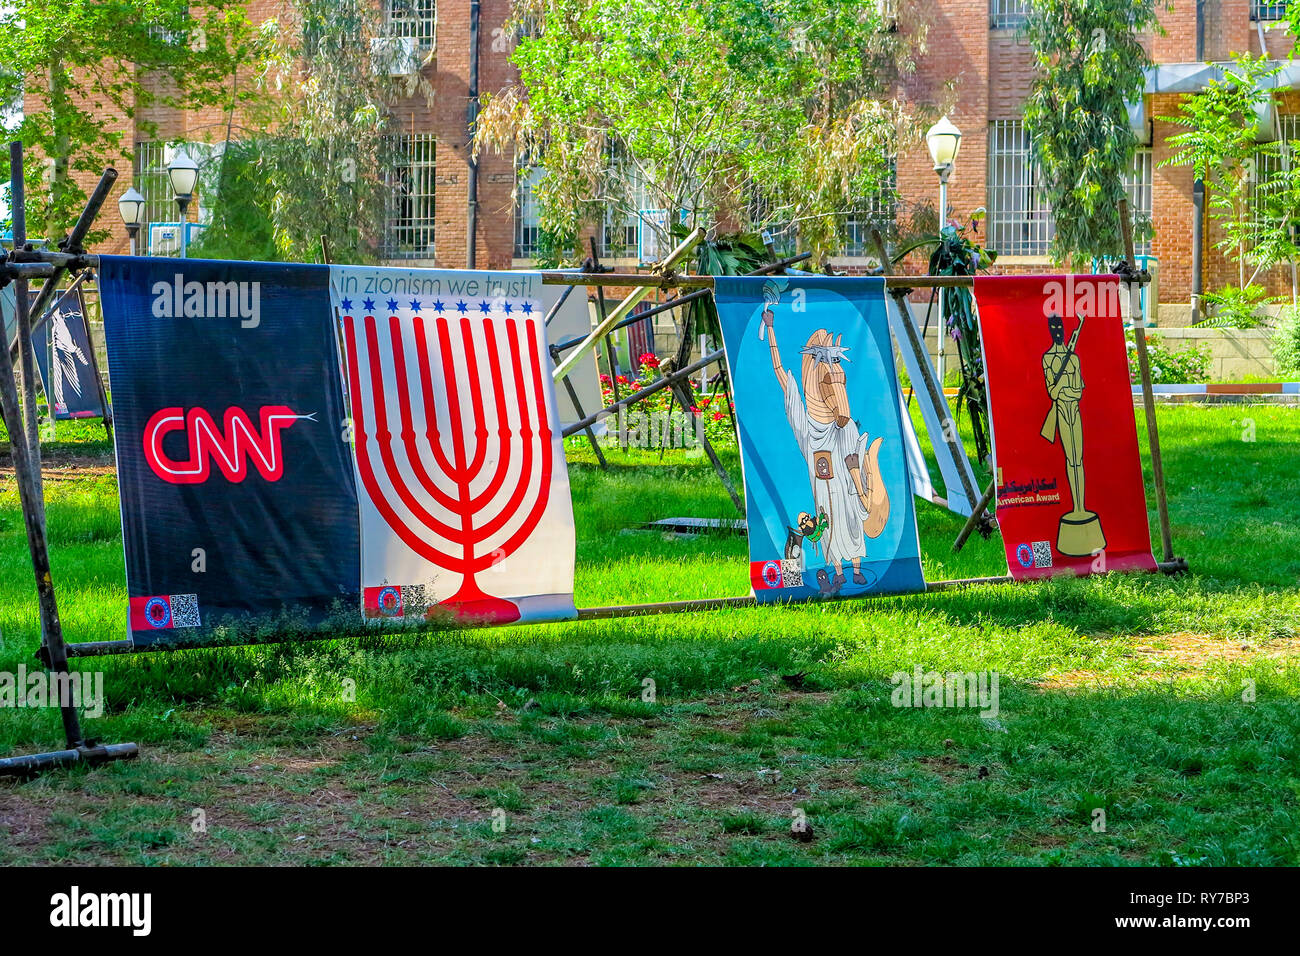 Tehran US Den of Espionage Former United States of America Embassy Anti American Iranian Patriotic Propaganda Zionism - Stock Image